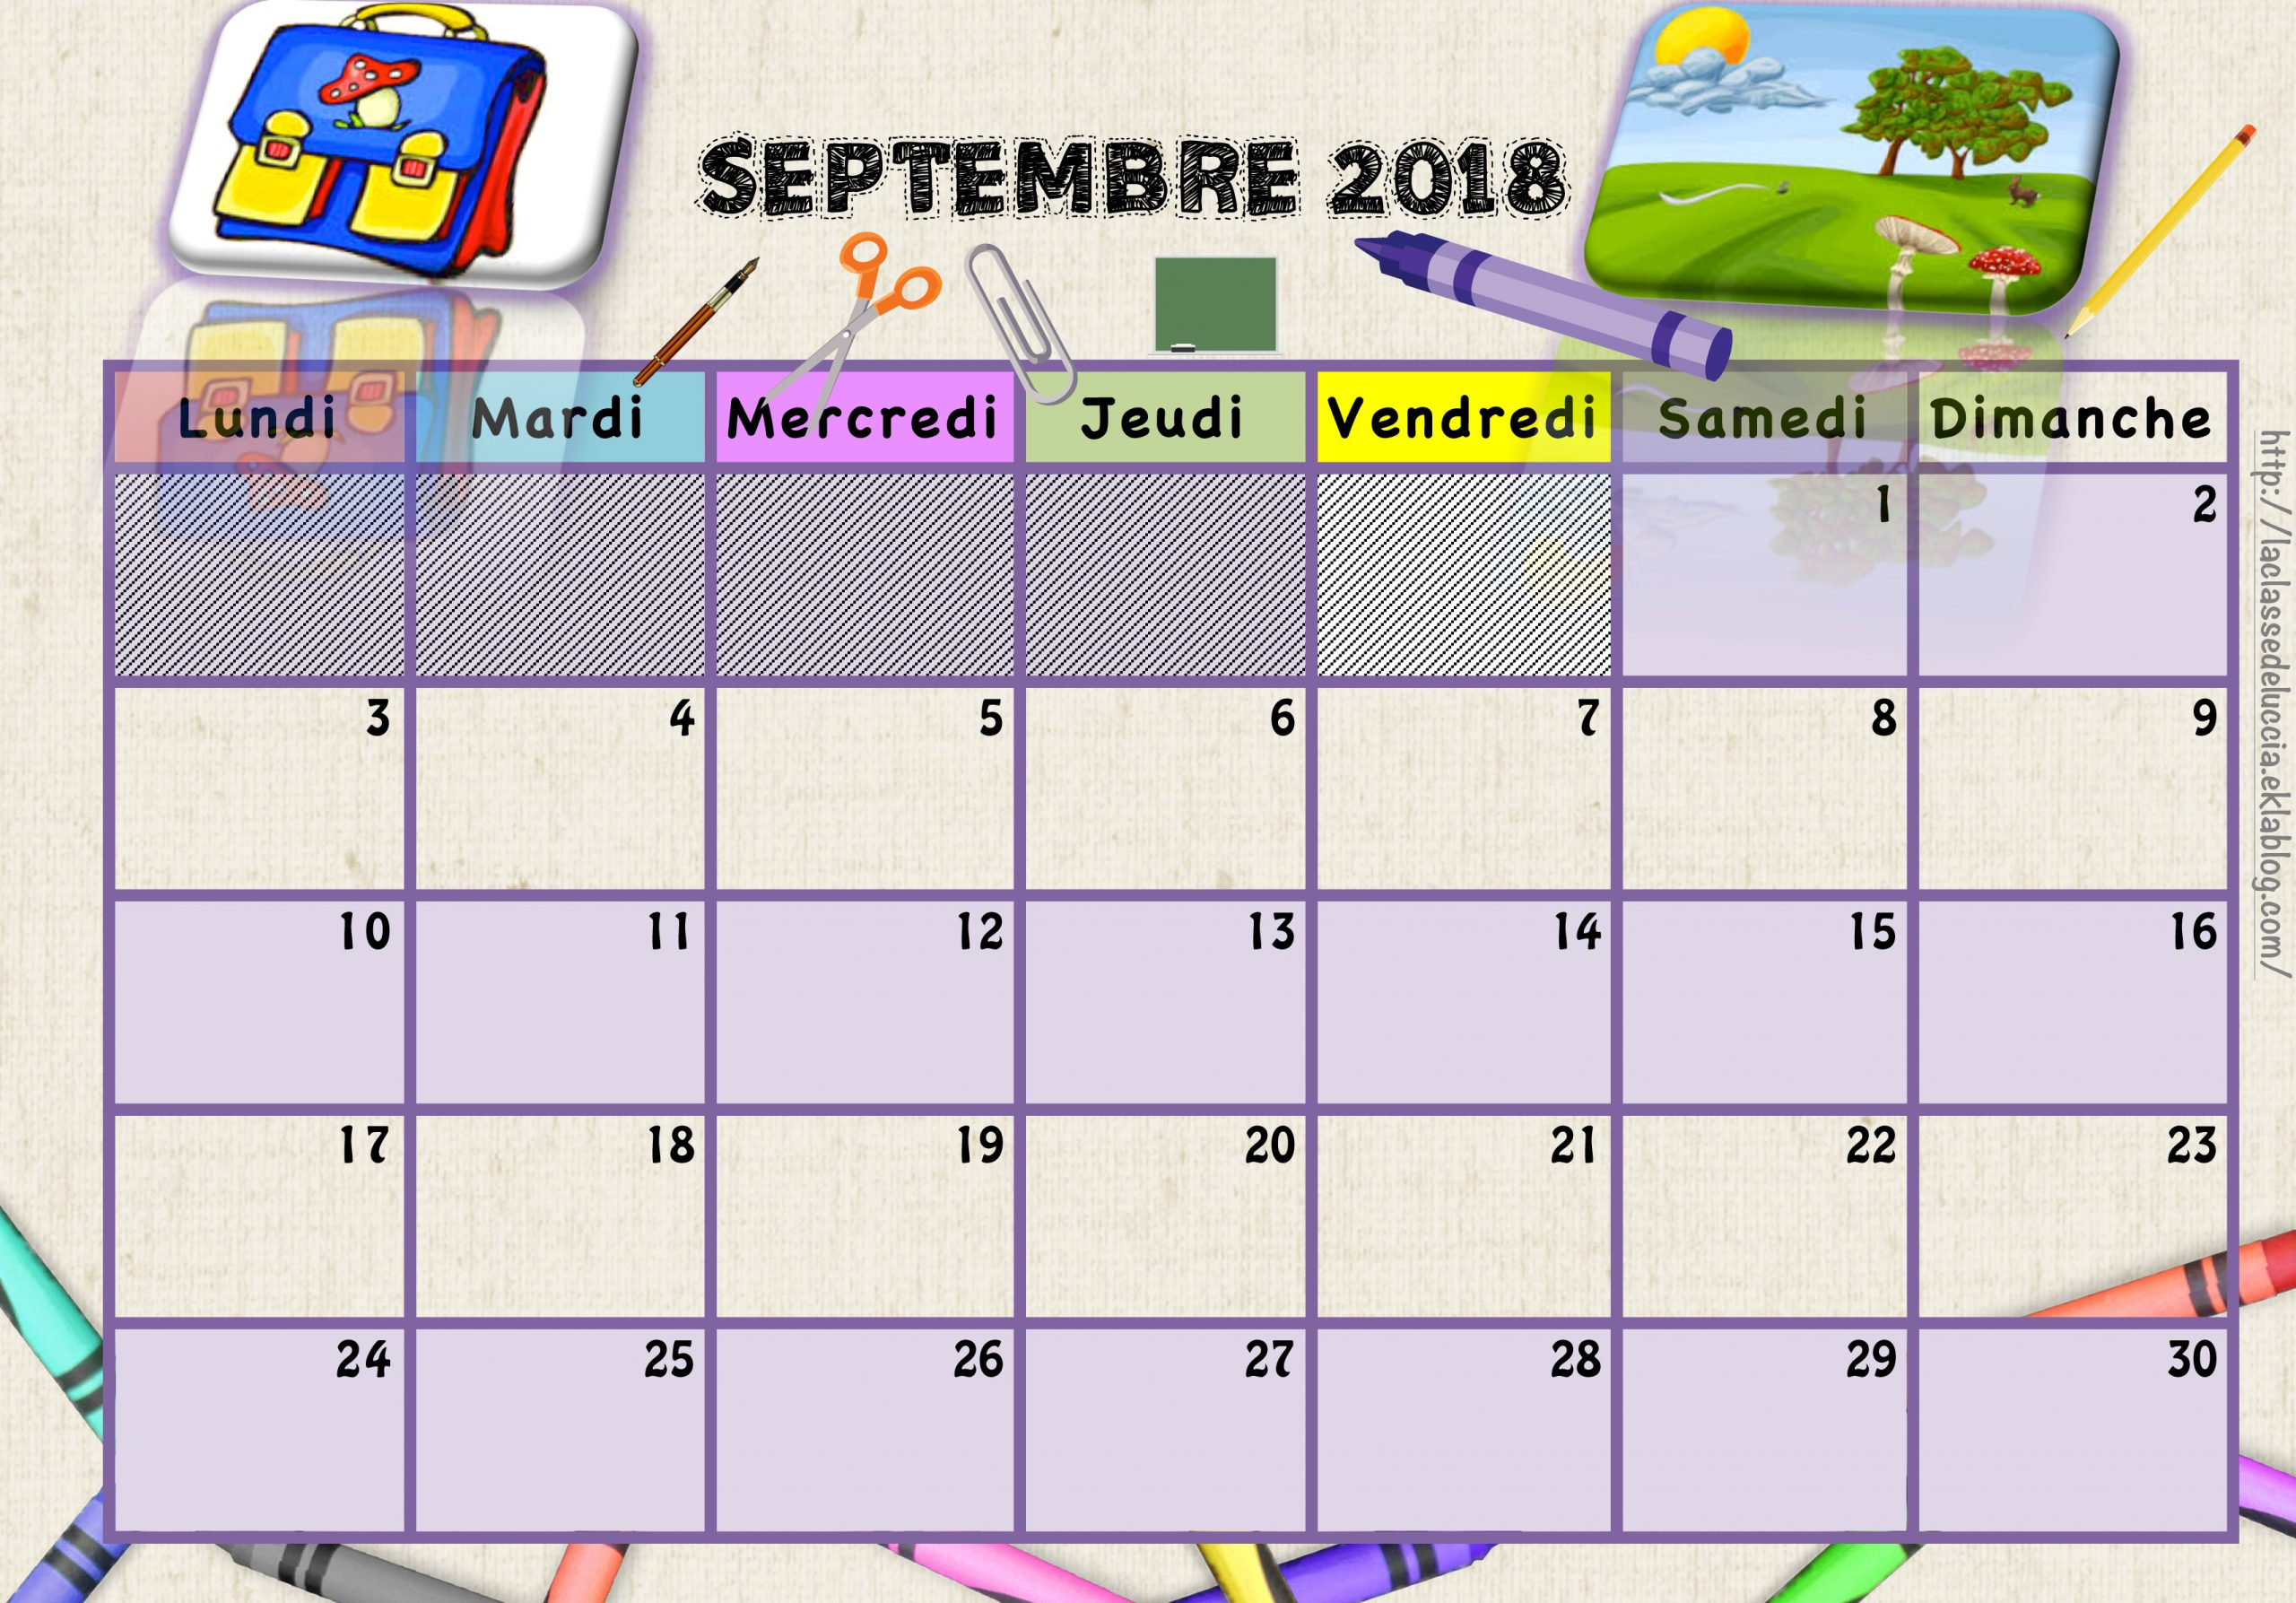 Calendriers Enfants 2018/2019 - La Classe De Luccia ! concernant Calendrier 2018 Enfant